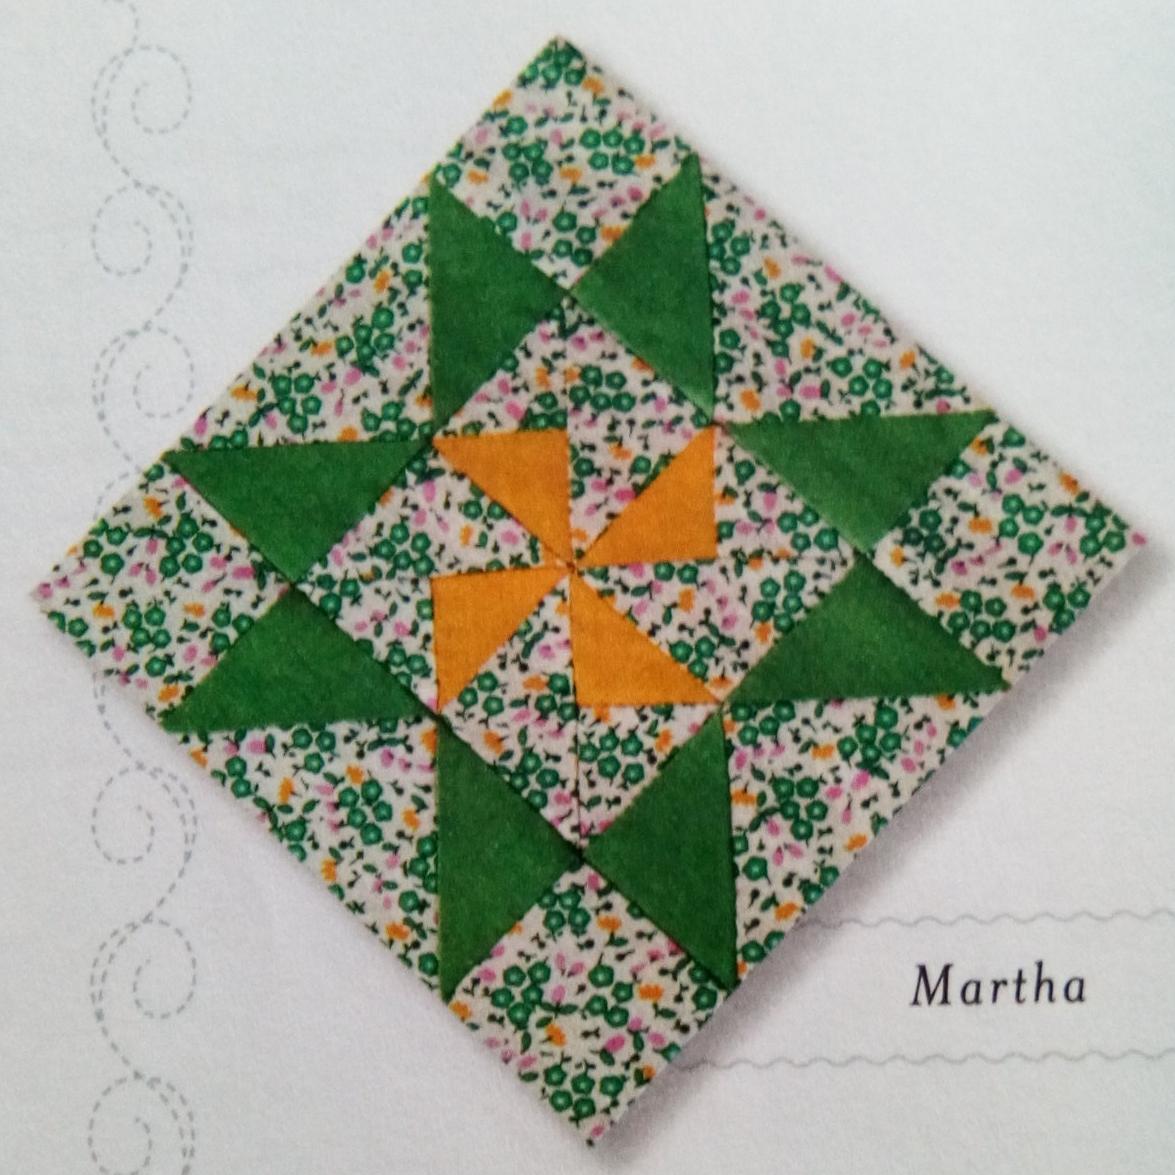 Martha: Coming December 19